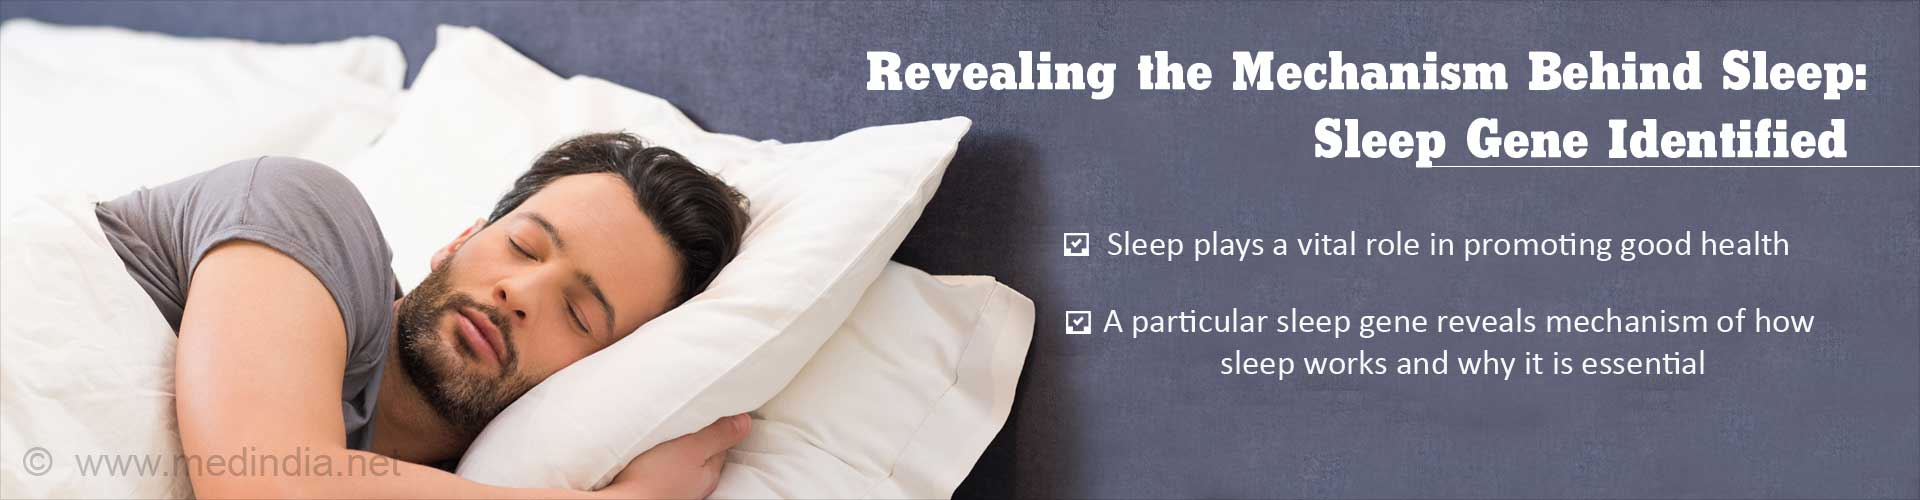 'Sleep Gene' Identified - Mechanism Reveals Why We Need Sleep